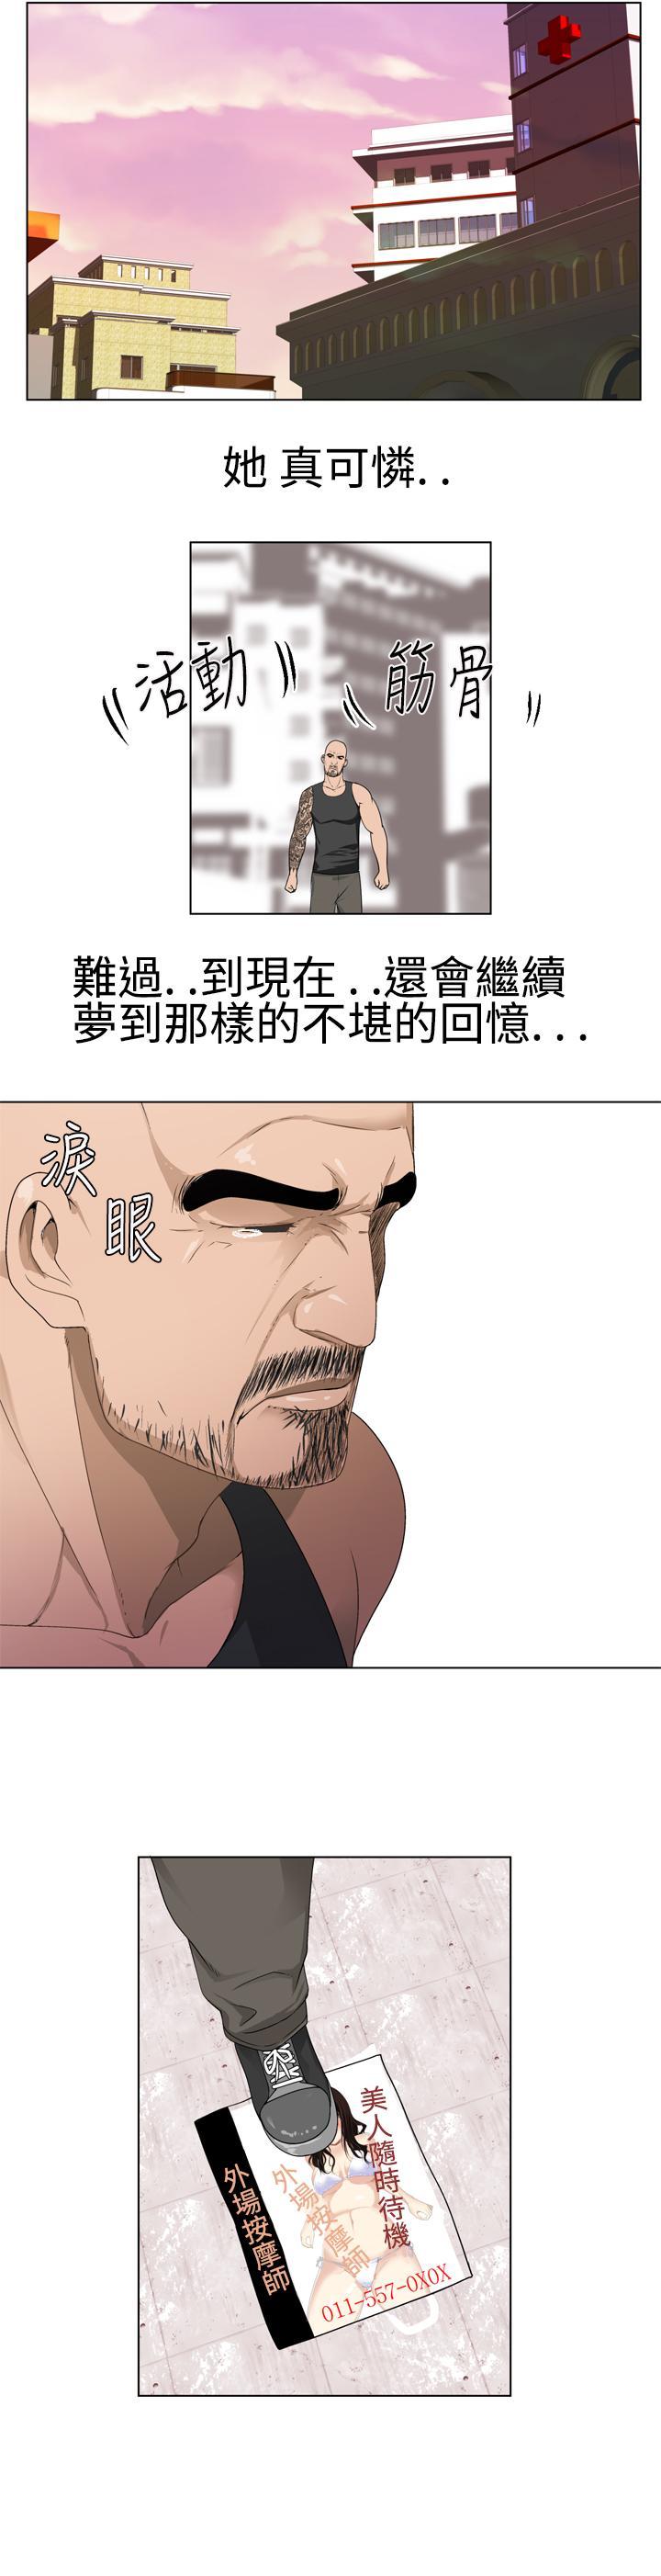 [SOSO] Franken Jo 为爱而生 法兰克赵 Ch.1~19 [Chinese]中文 389